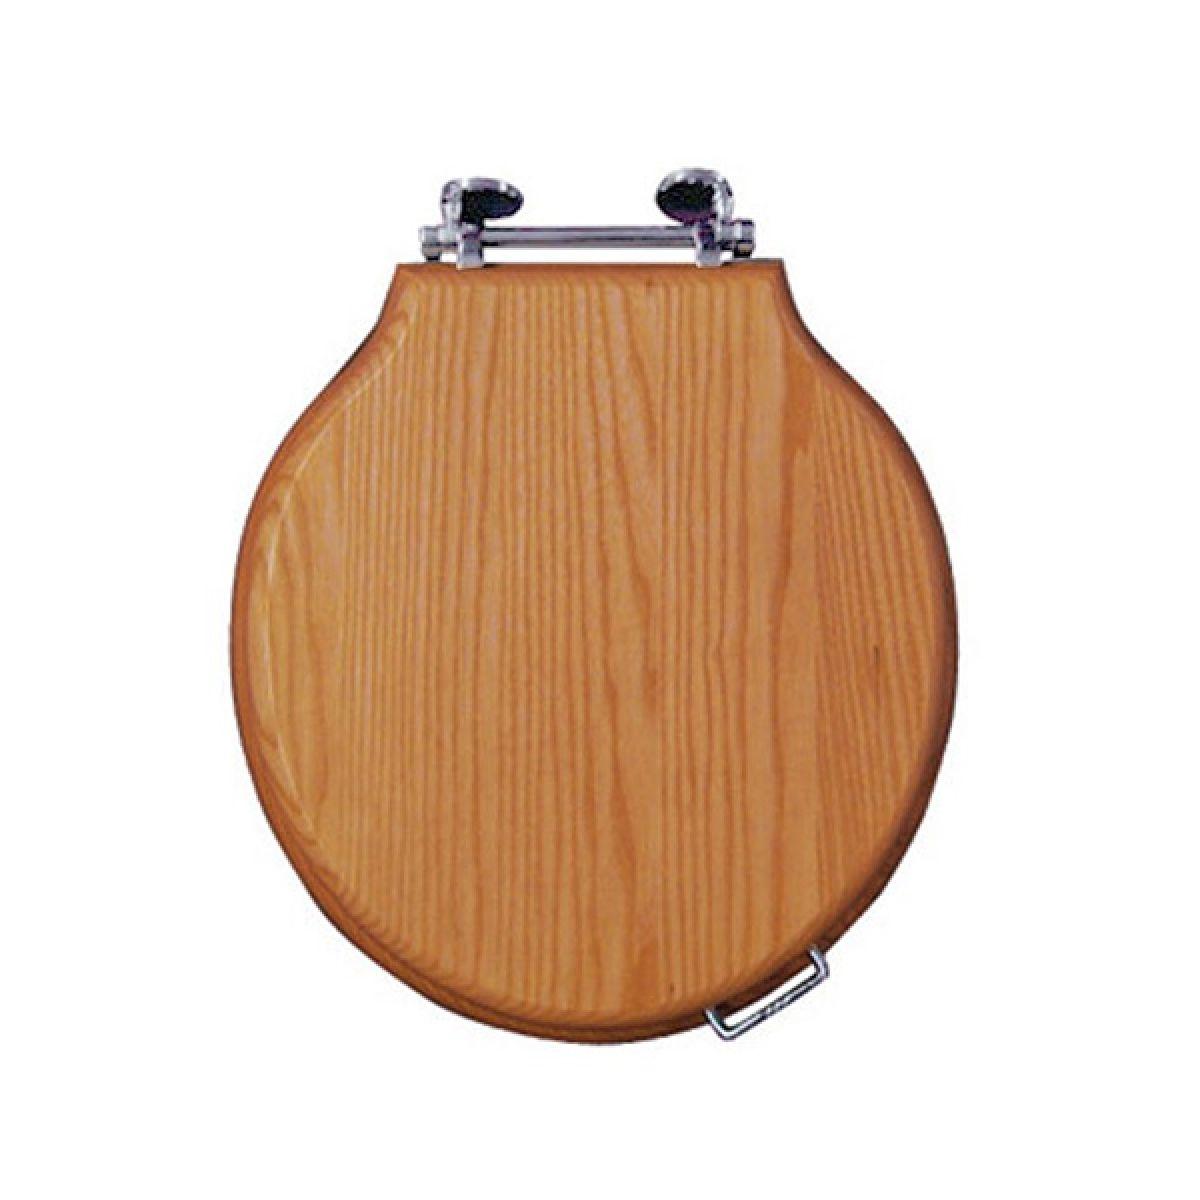 Imperial Etoile Solid Wood Toilet Seat Uk Bathrooms